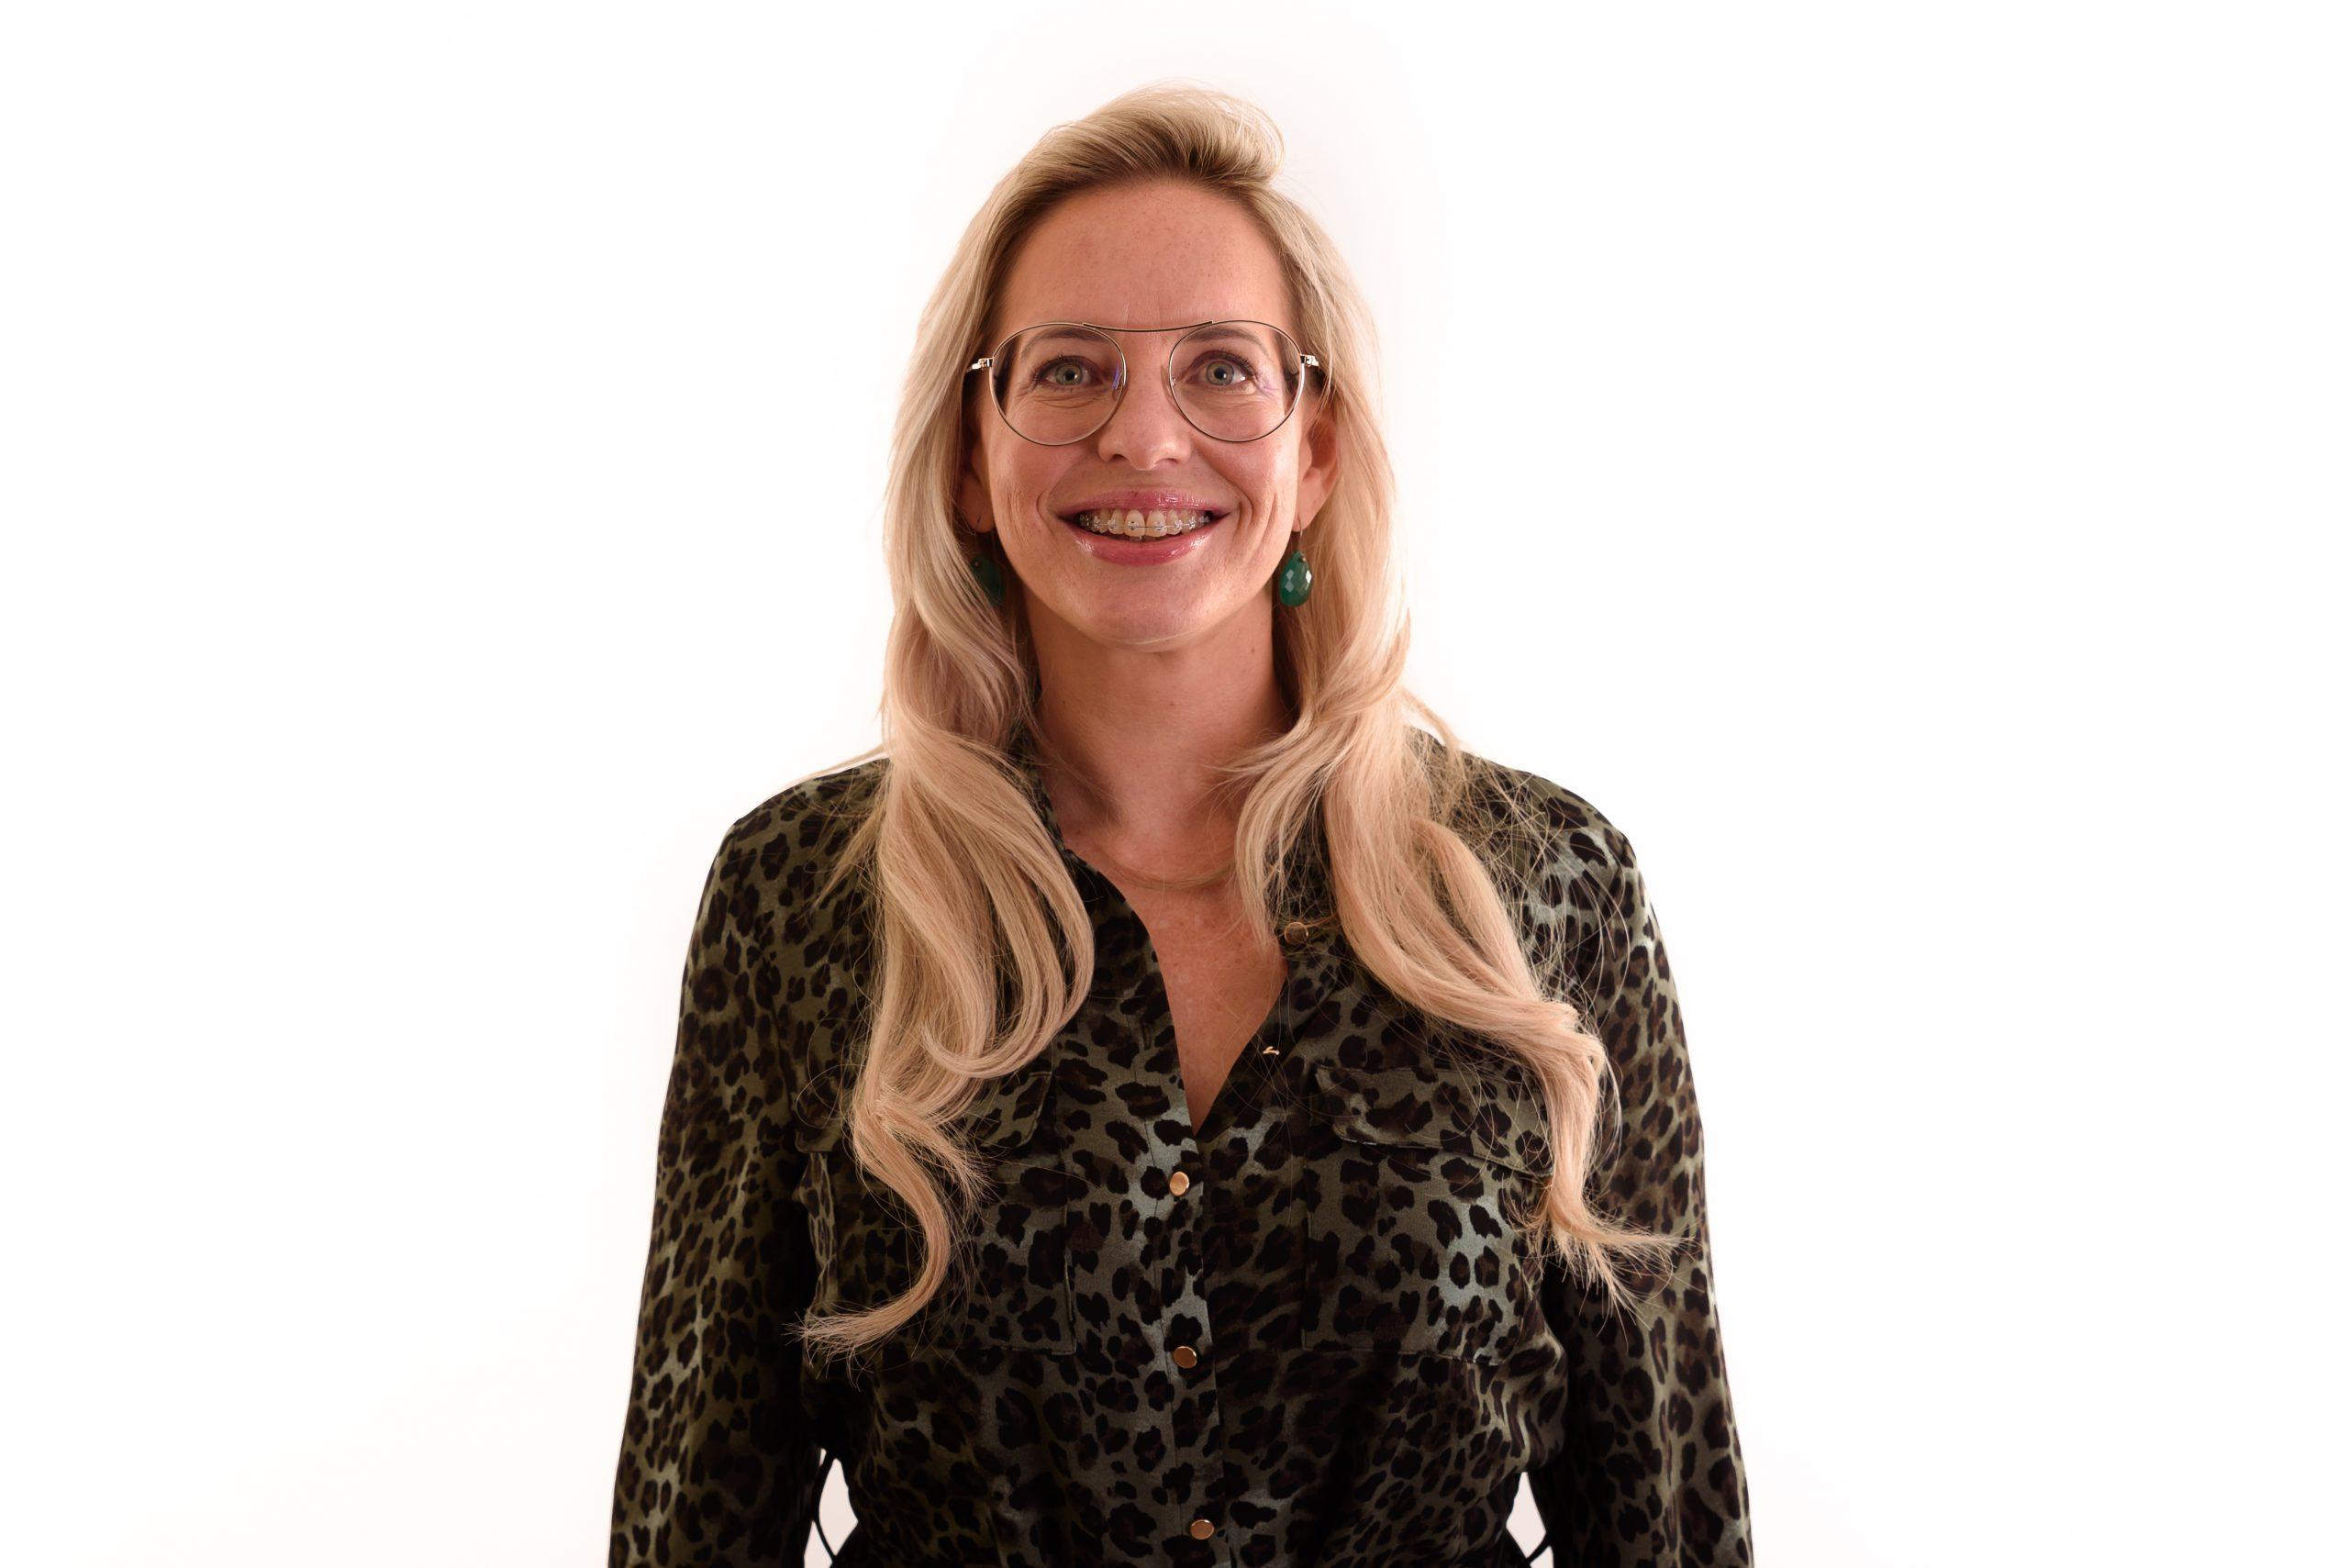 Carola van Eijk